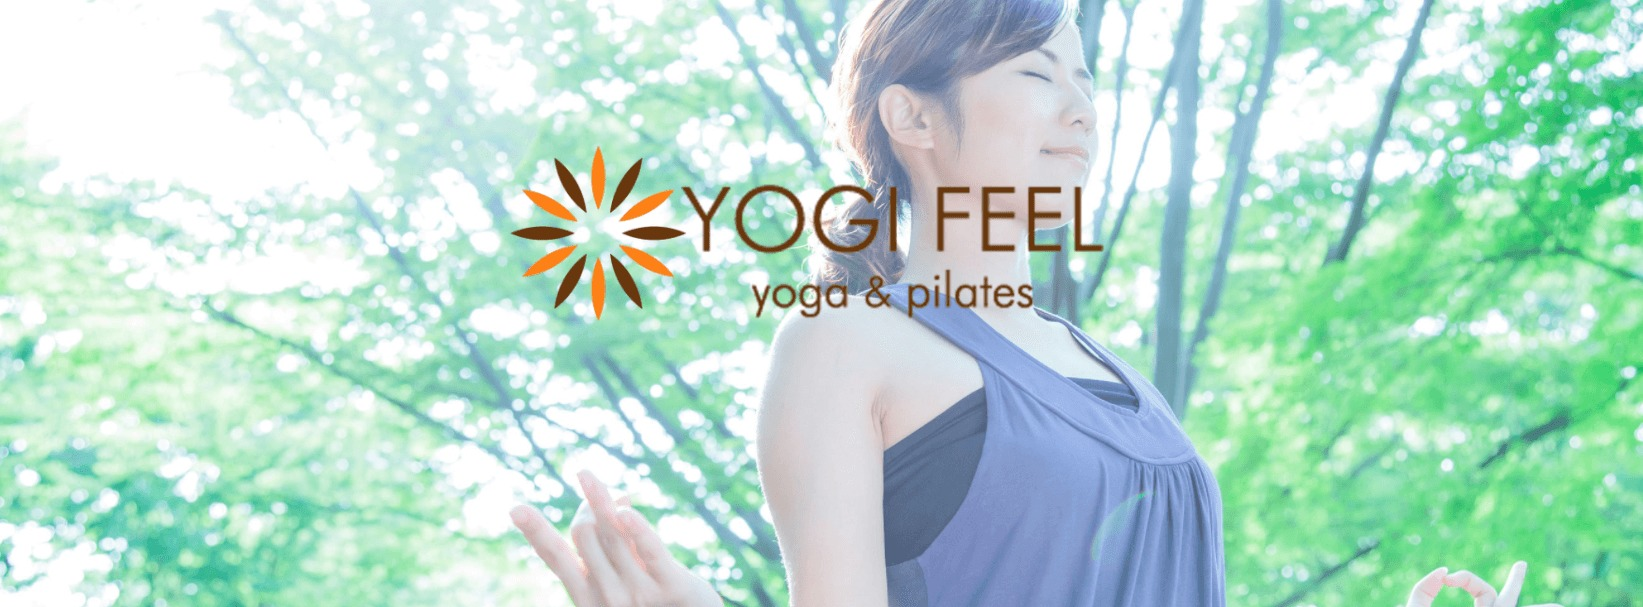 YOGI FEEL yoga&pilates